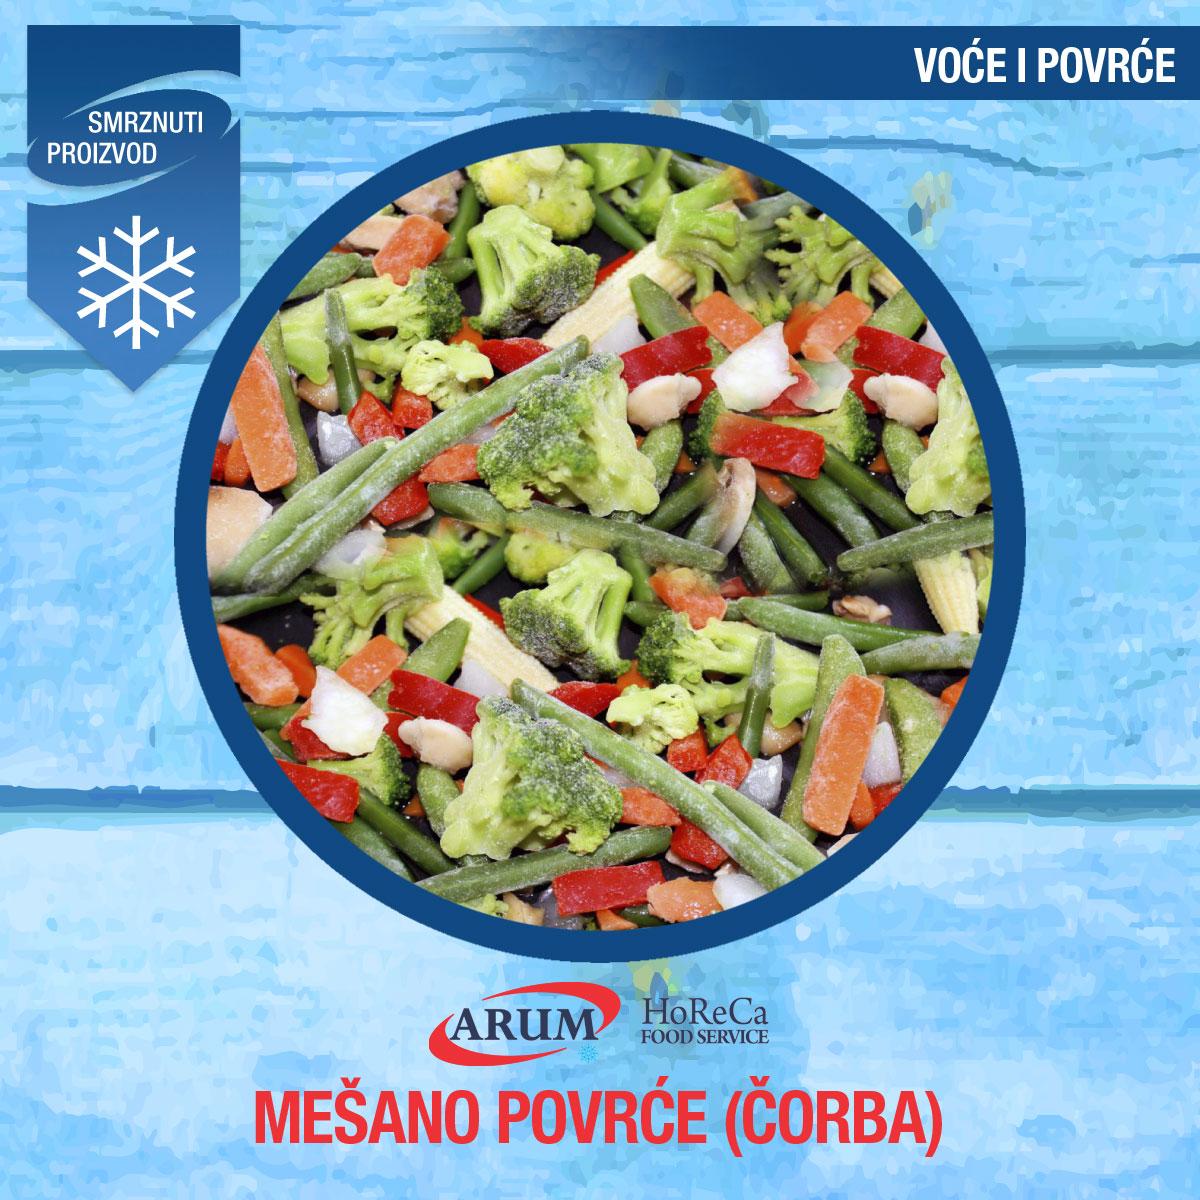 Mesano povrce 10/1 (corba)